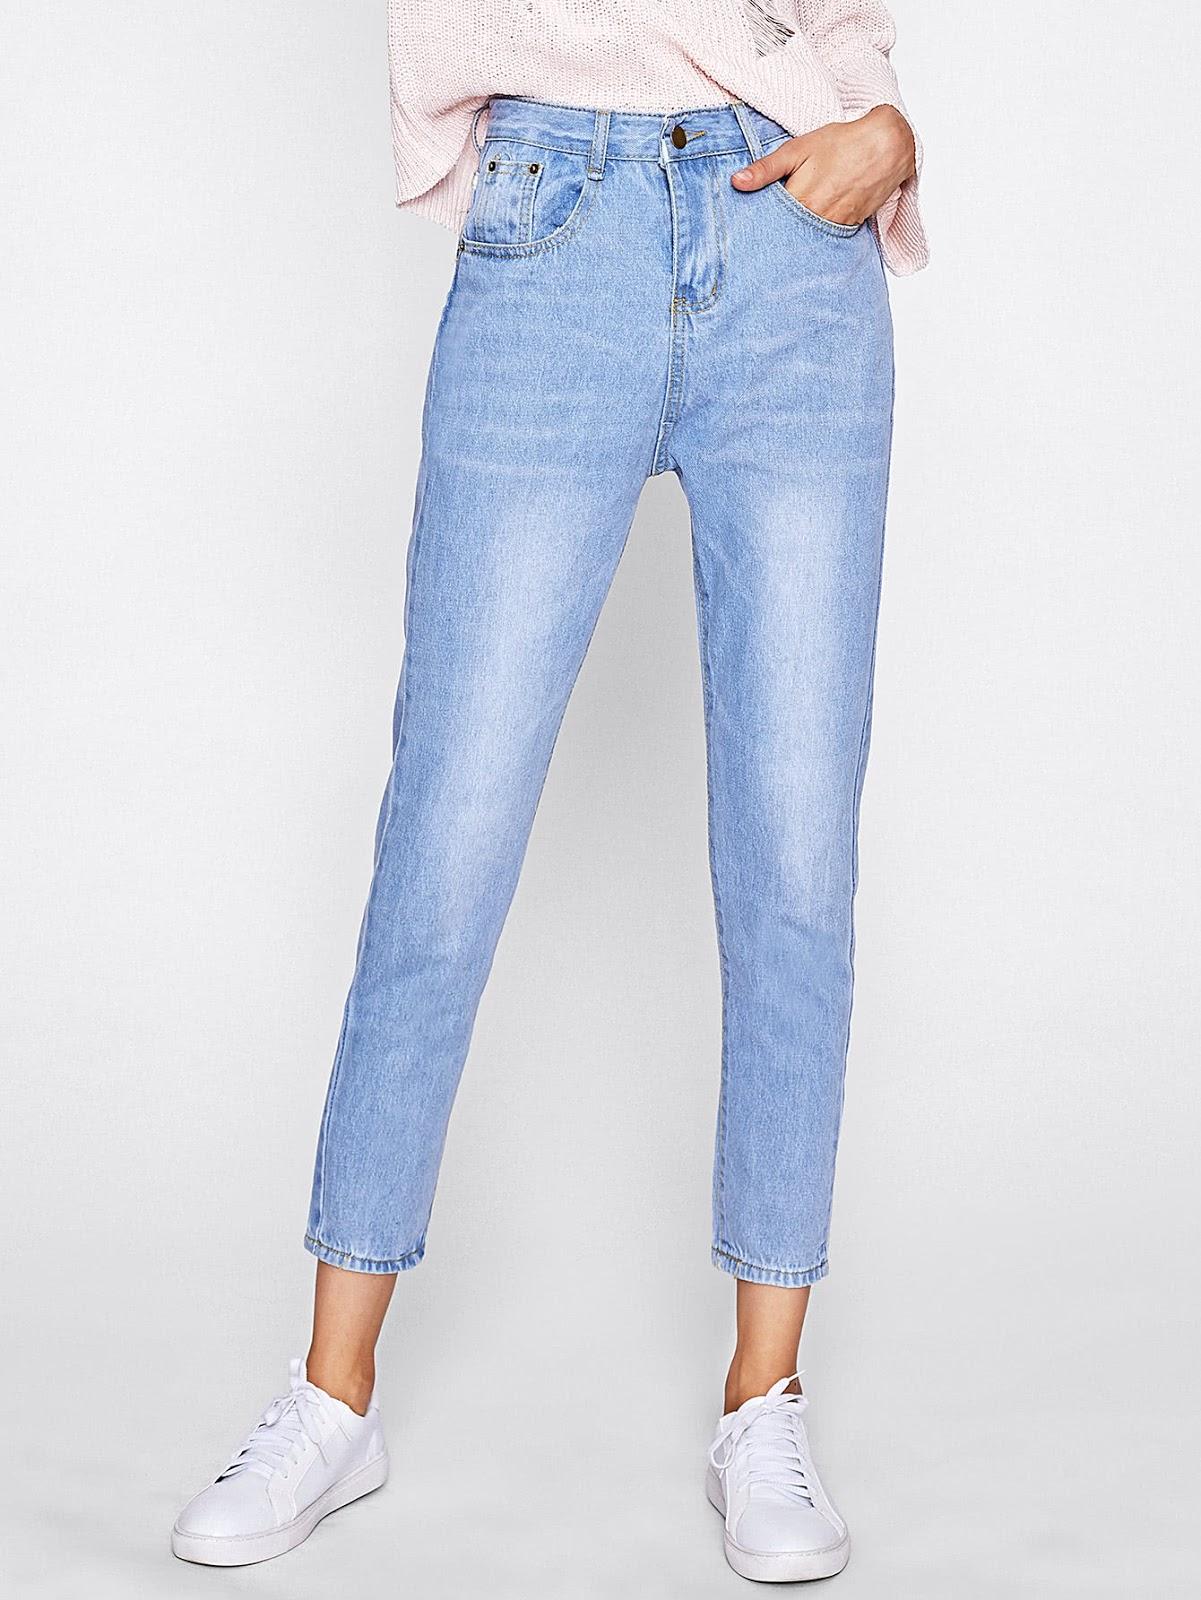 Bleach Wash Straight Jeans